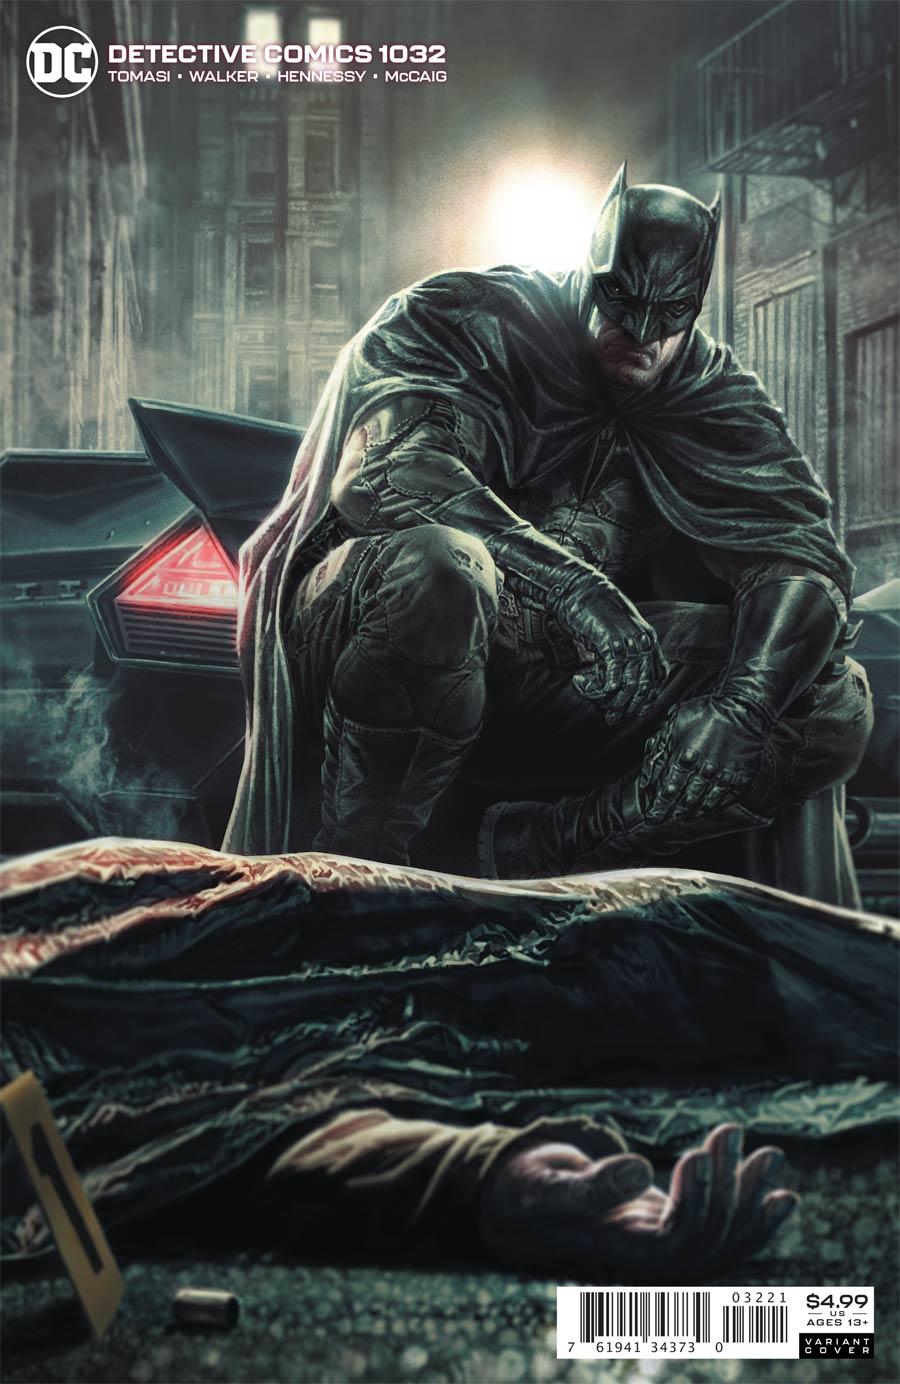 Detective Comics Vol 2 #1032 Cover B Variant Lee Bermejo Card Stock Cover